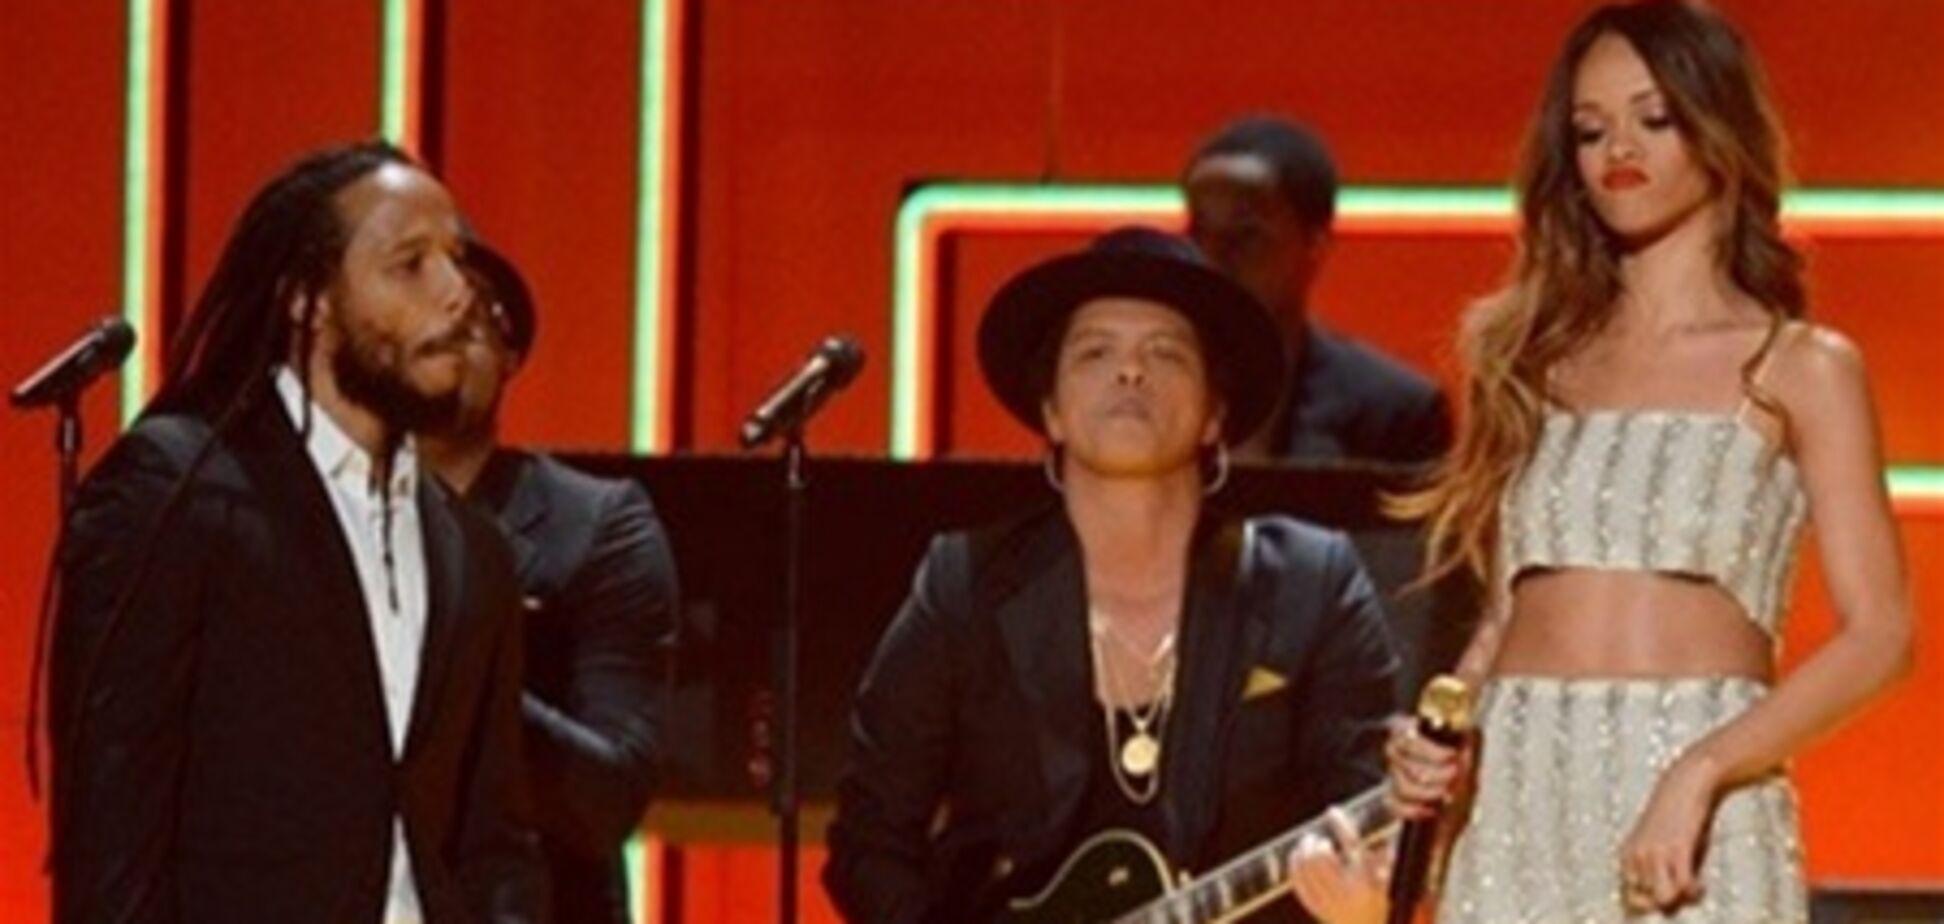 Рианна, Стинг, Бруно Марс и Дилан Марли зажгли Грэмми. Видео